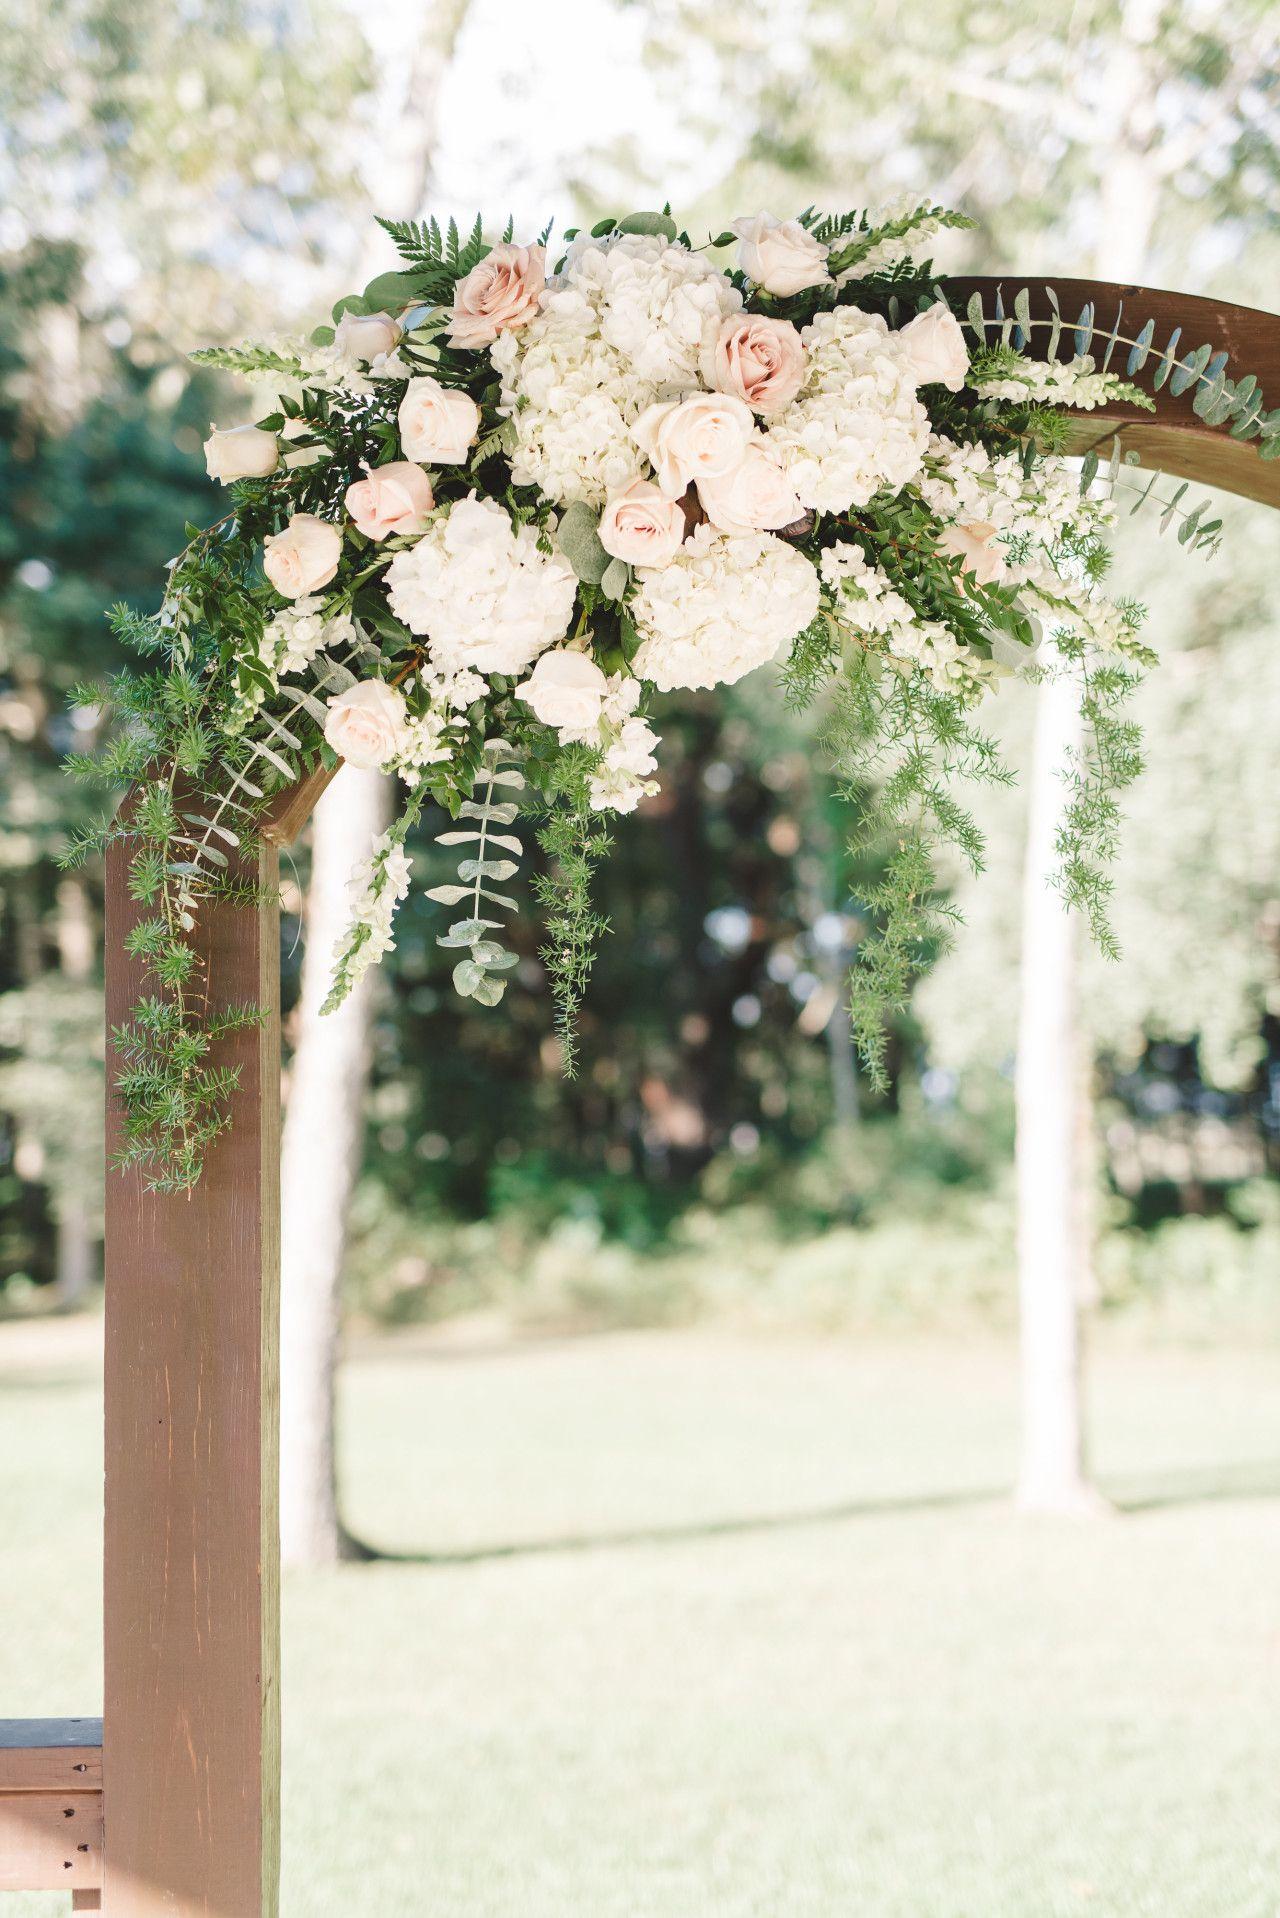 Wedding Arch Decor Blush Pink Wedding Decorations Outdoor